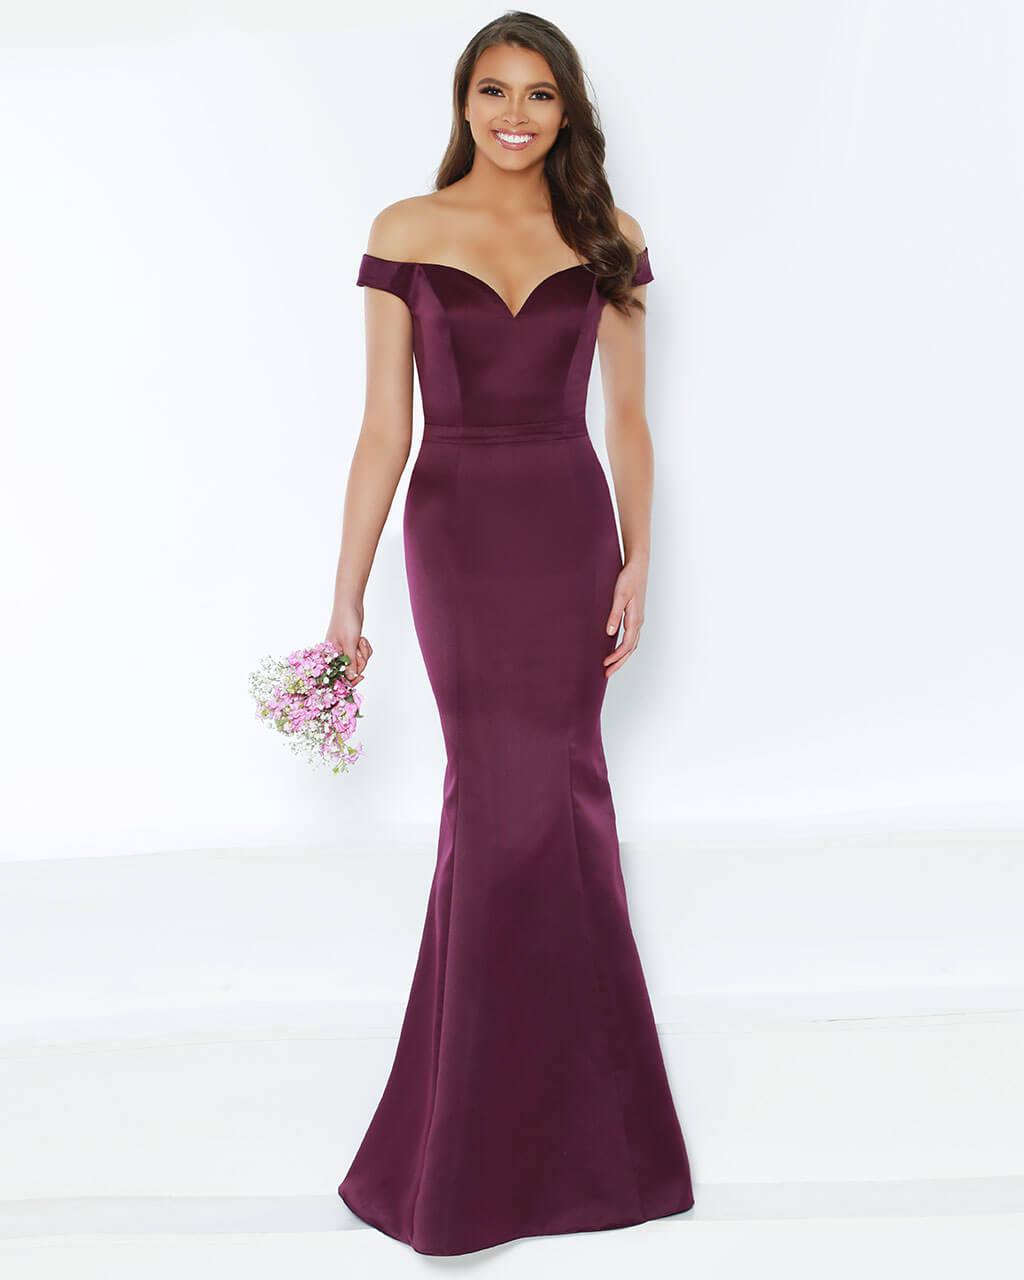 Bridal Party - Kanali K